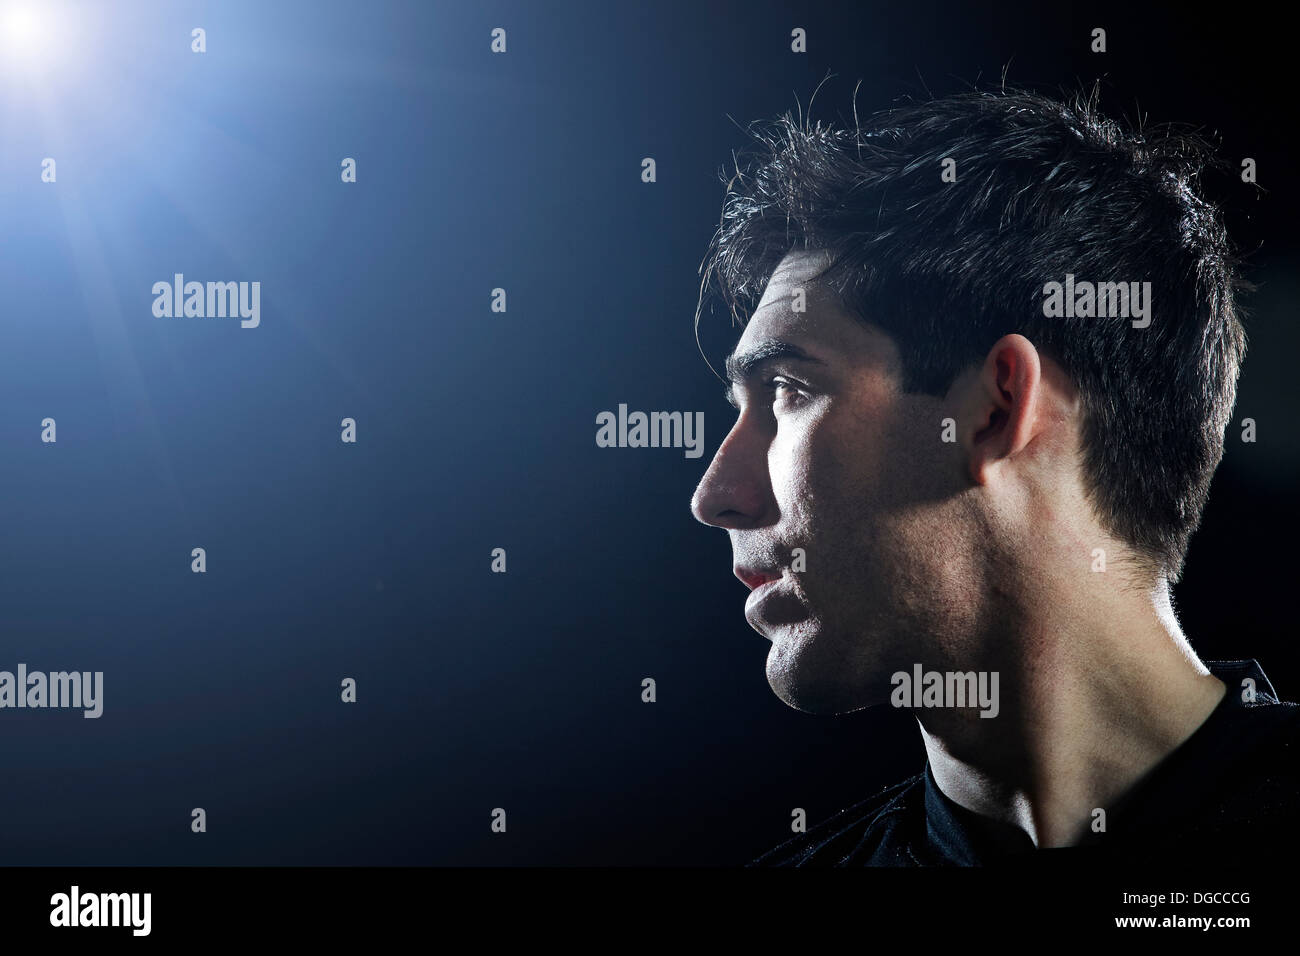 Primer plano de un joven jugador de fútbol masculino Foto de stock